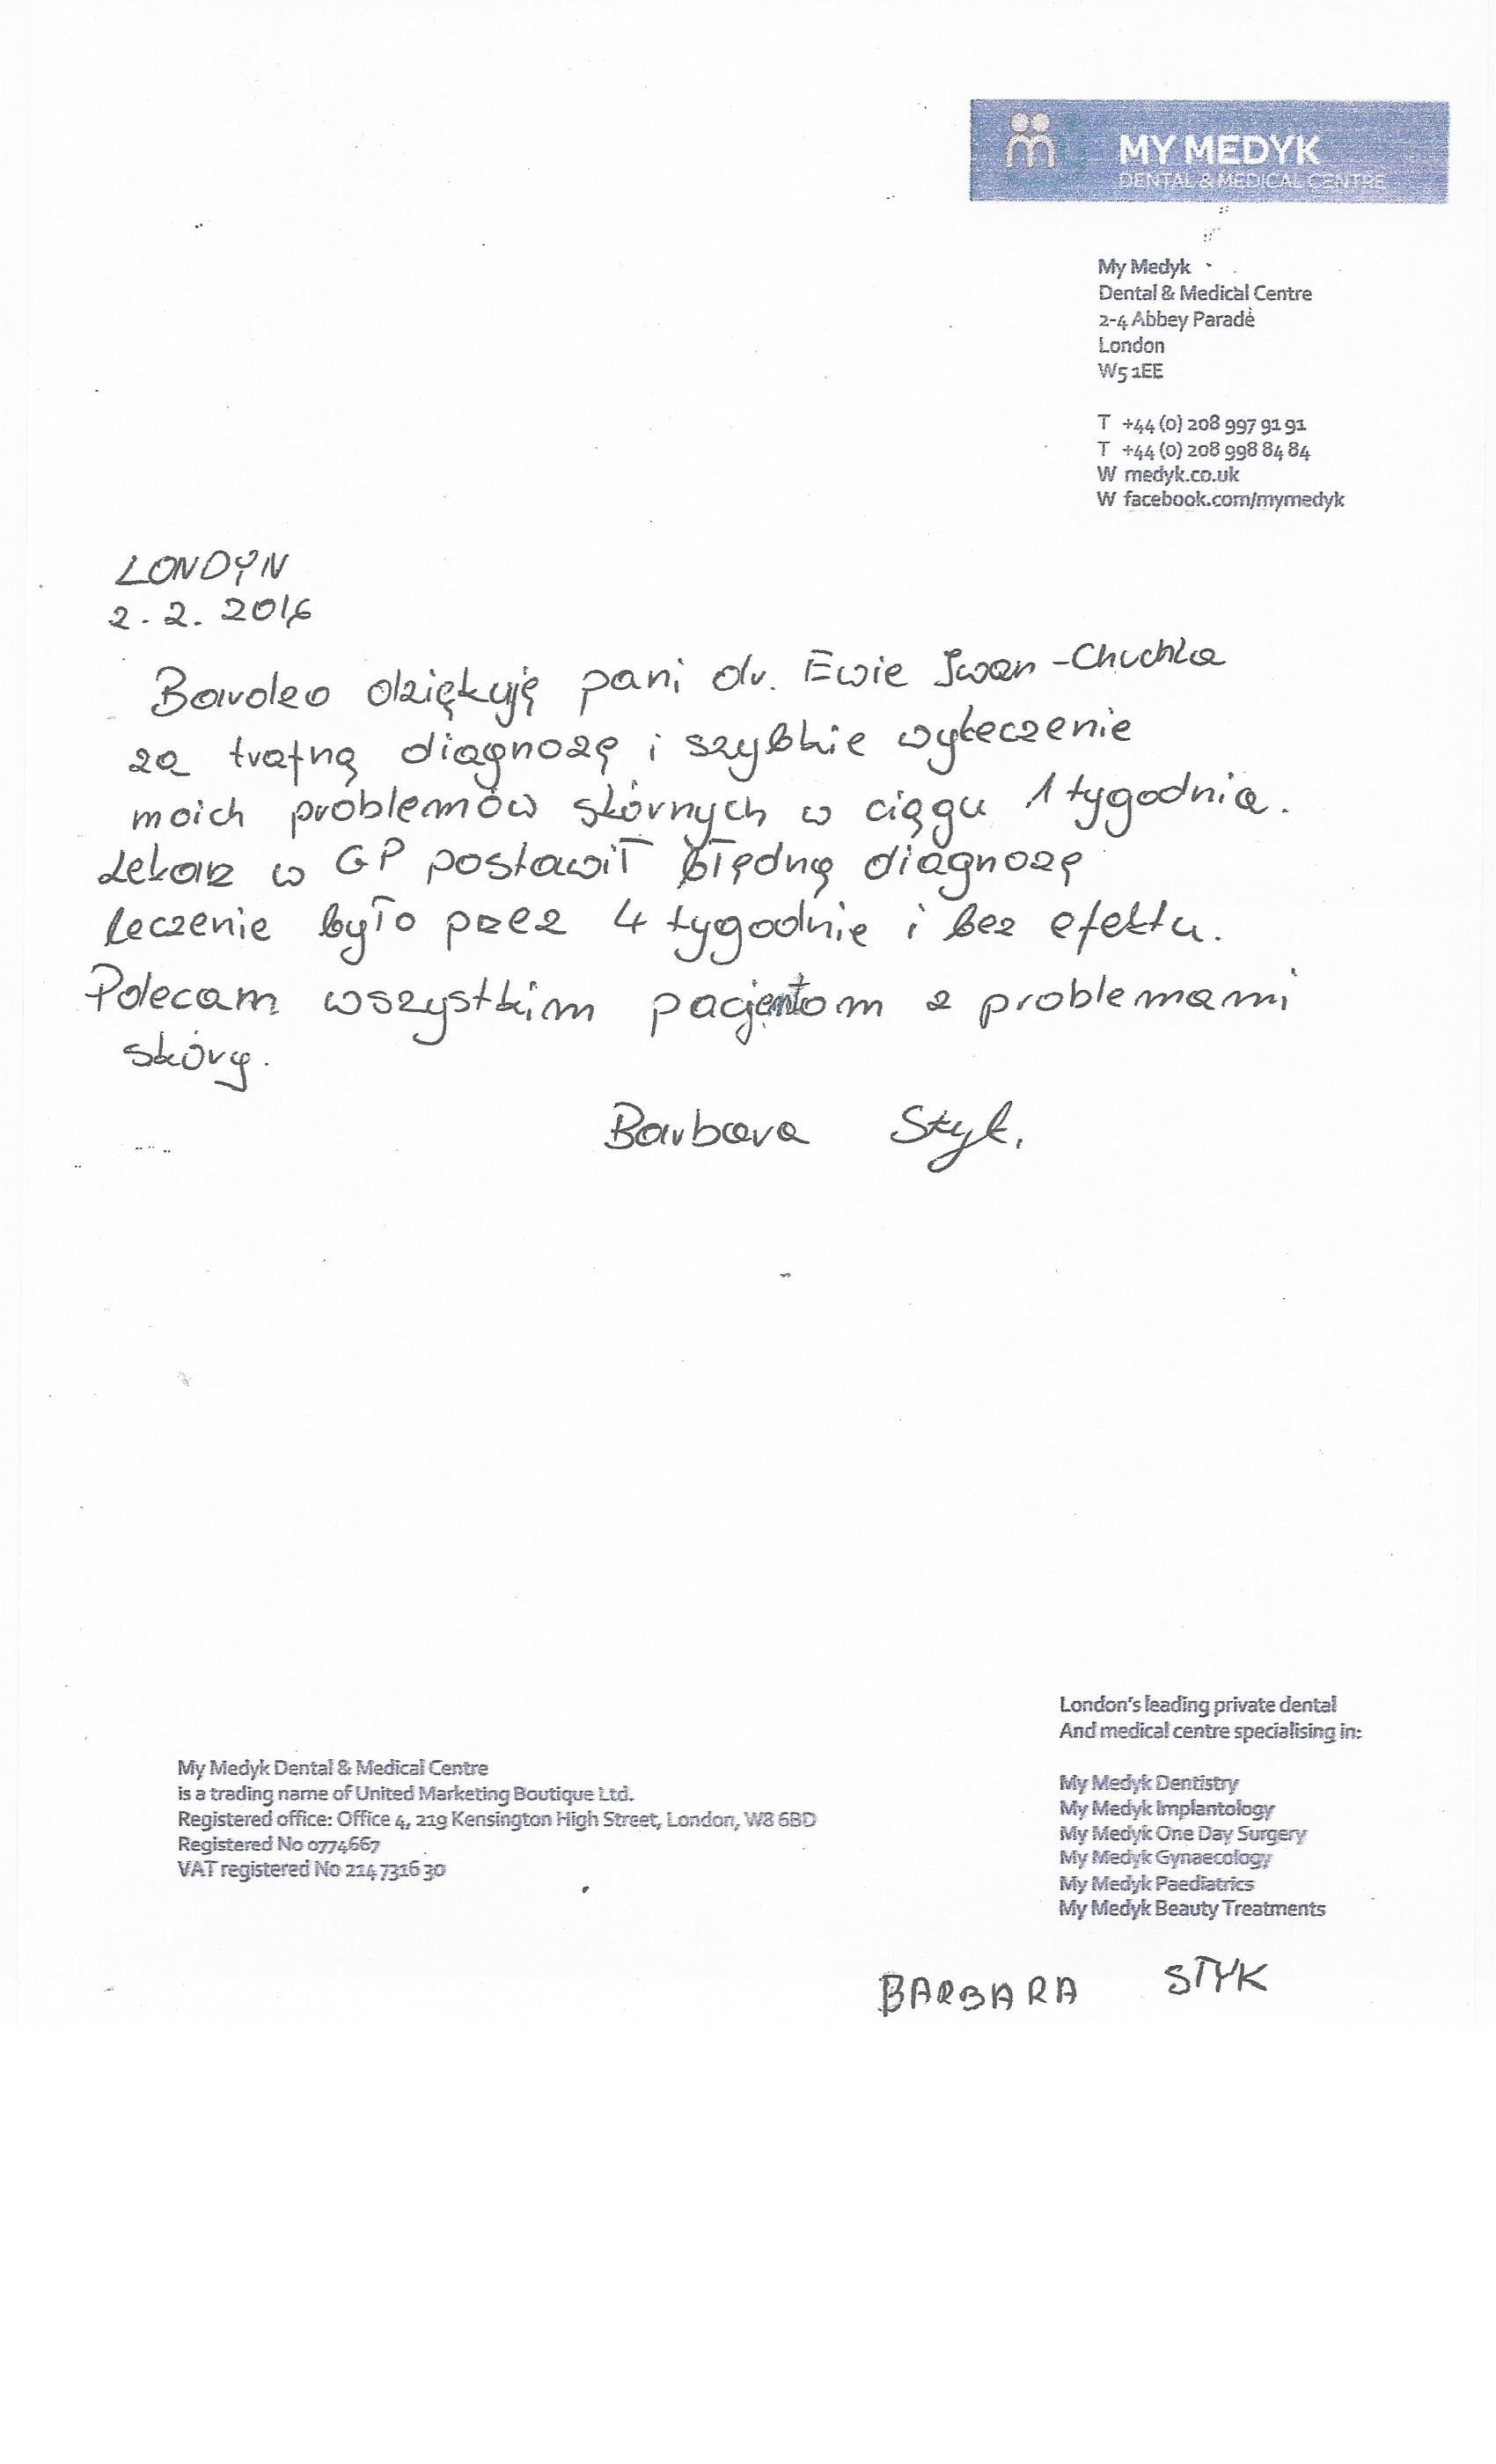 rekomendacje EWA IWAN-CHUCHLA MyMedyk